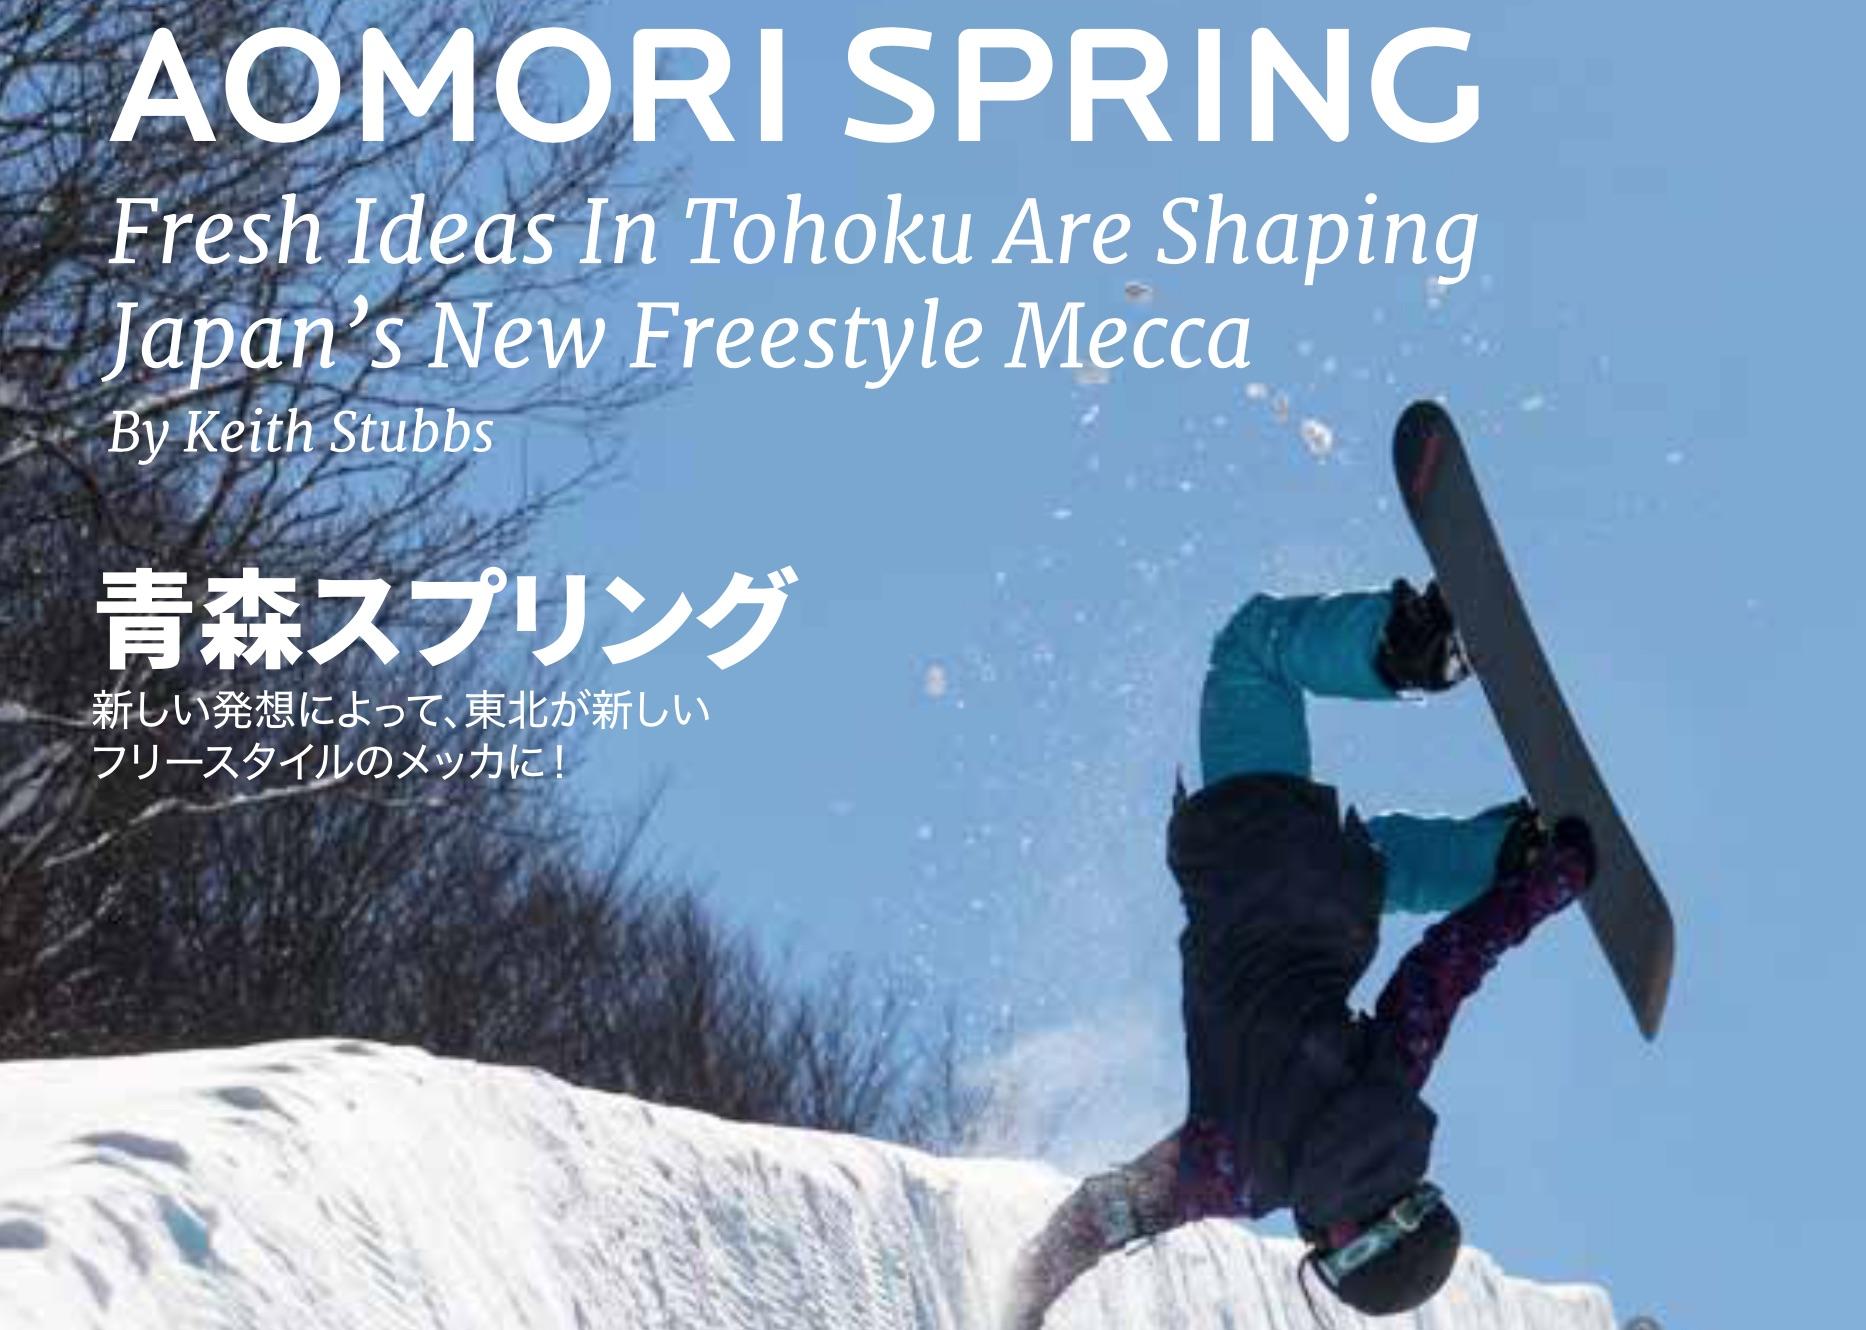 Outdoor Japan Article on Aomori Spring